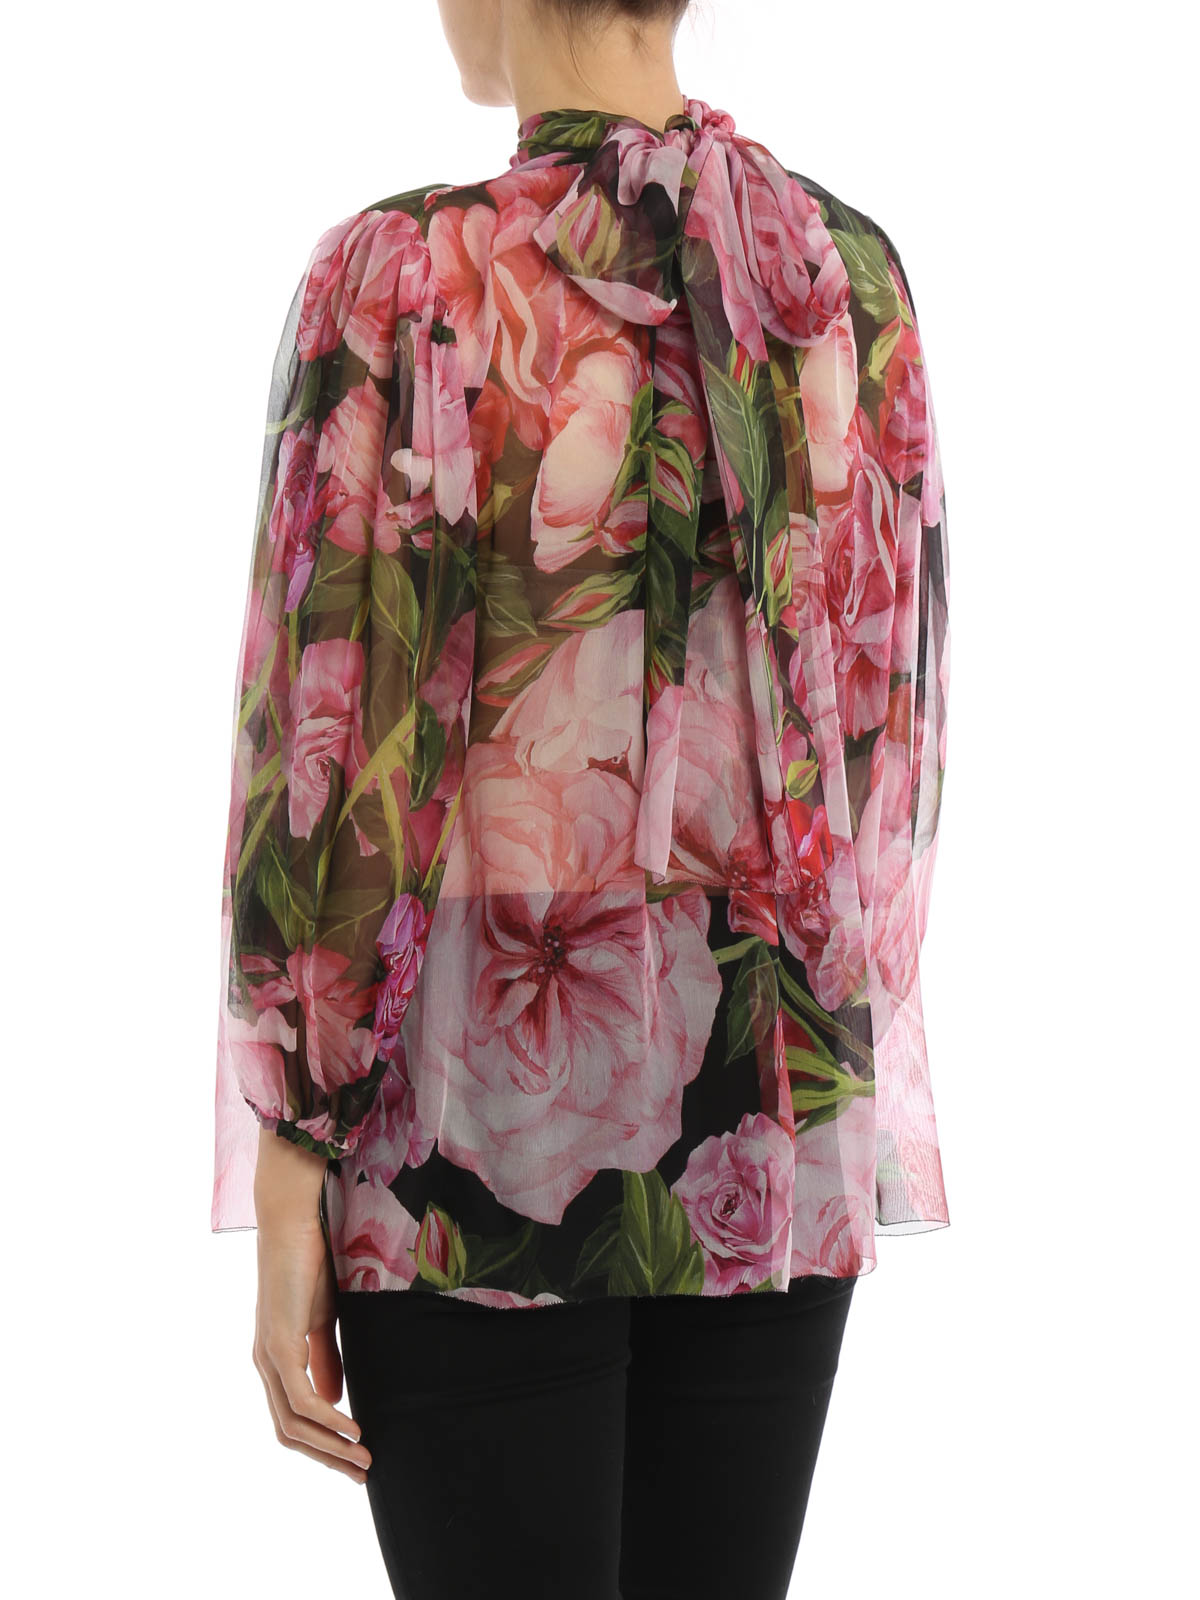 Dolce  Gabbana - Rose Print Silk Chiffon Blouse - Blouses -7421